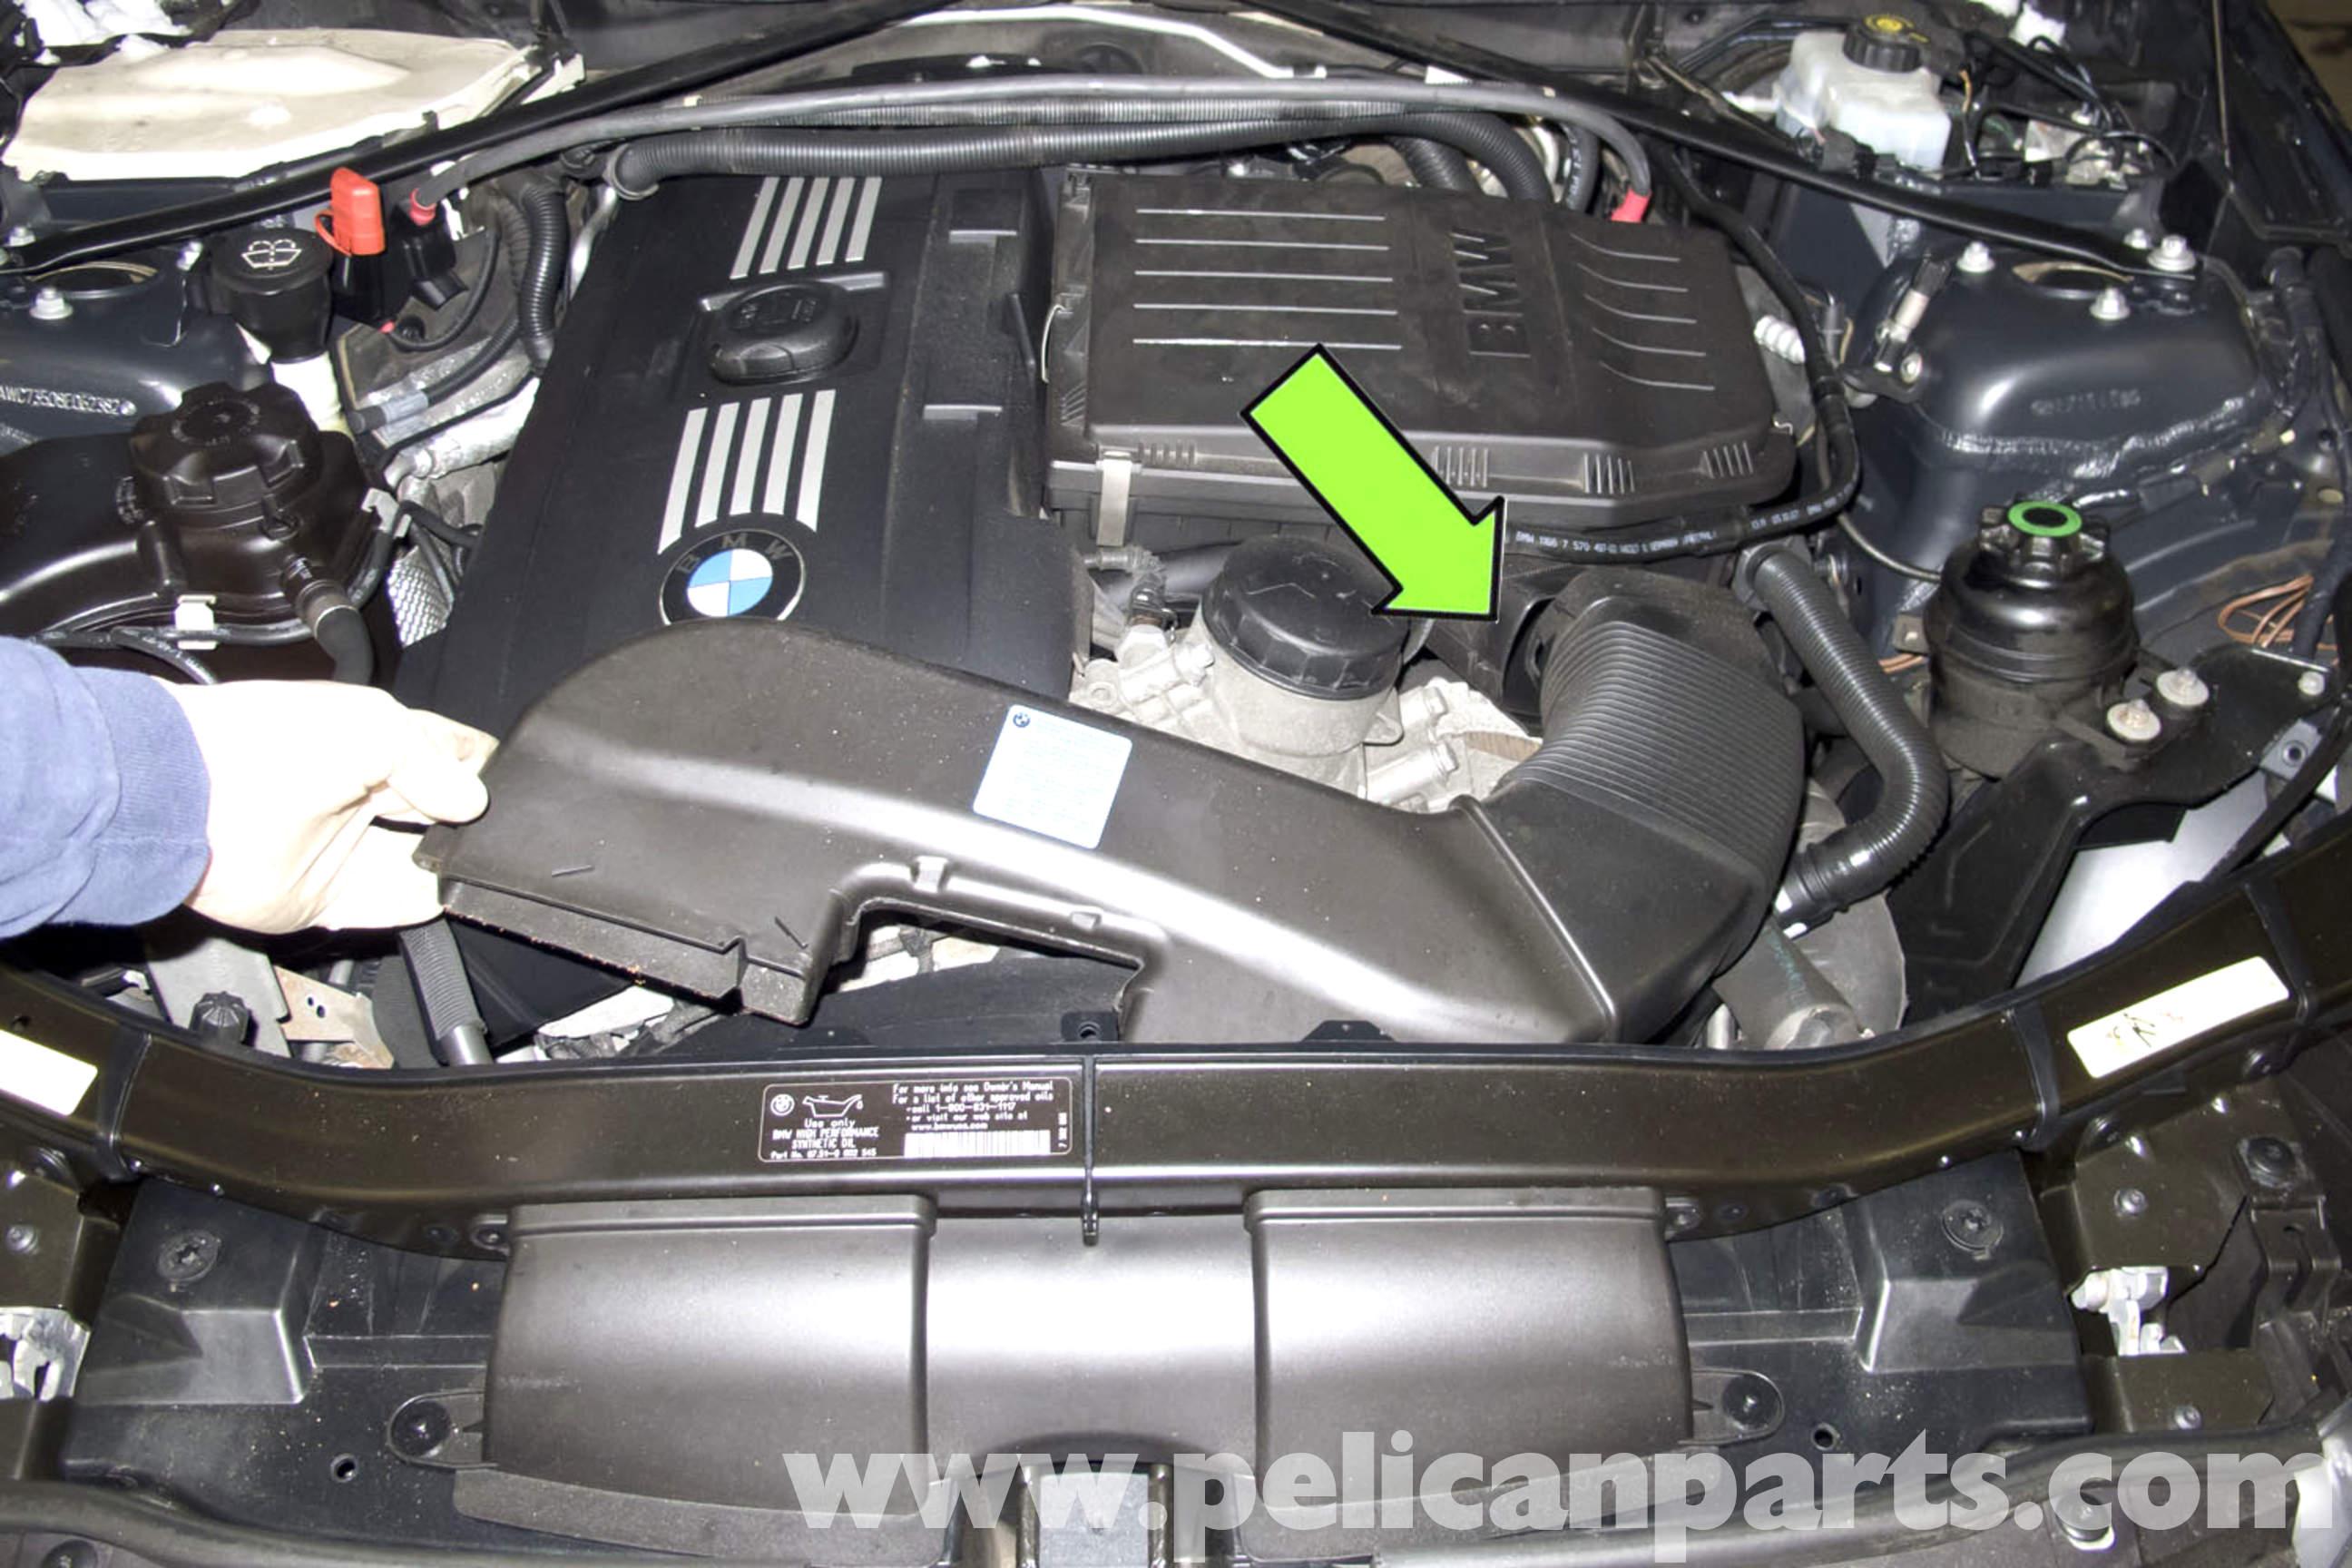 BMW E90 Knock Sensor Replacement   E91, E92, E93   Pelican